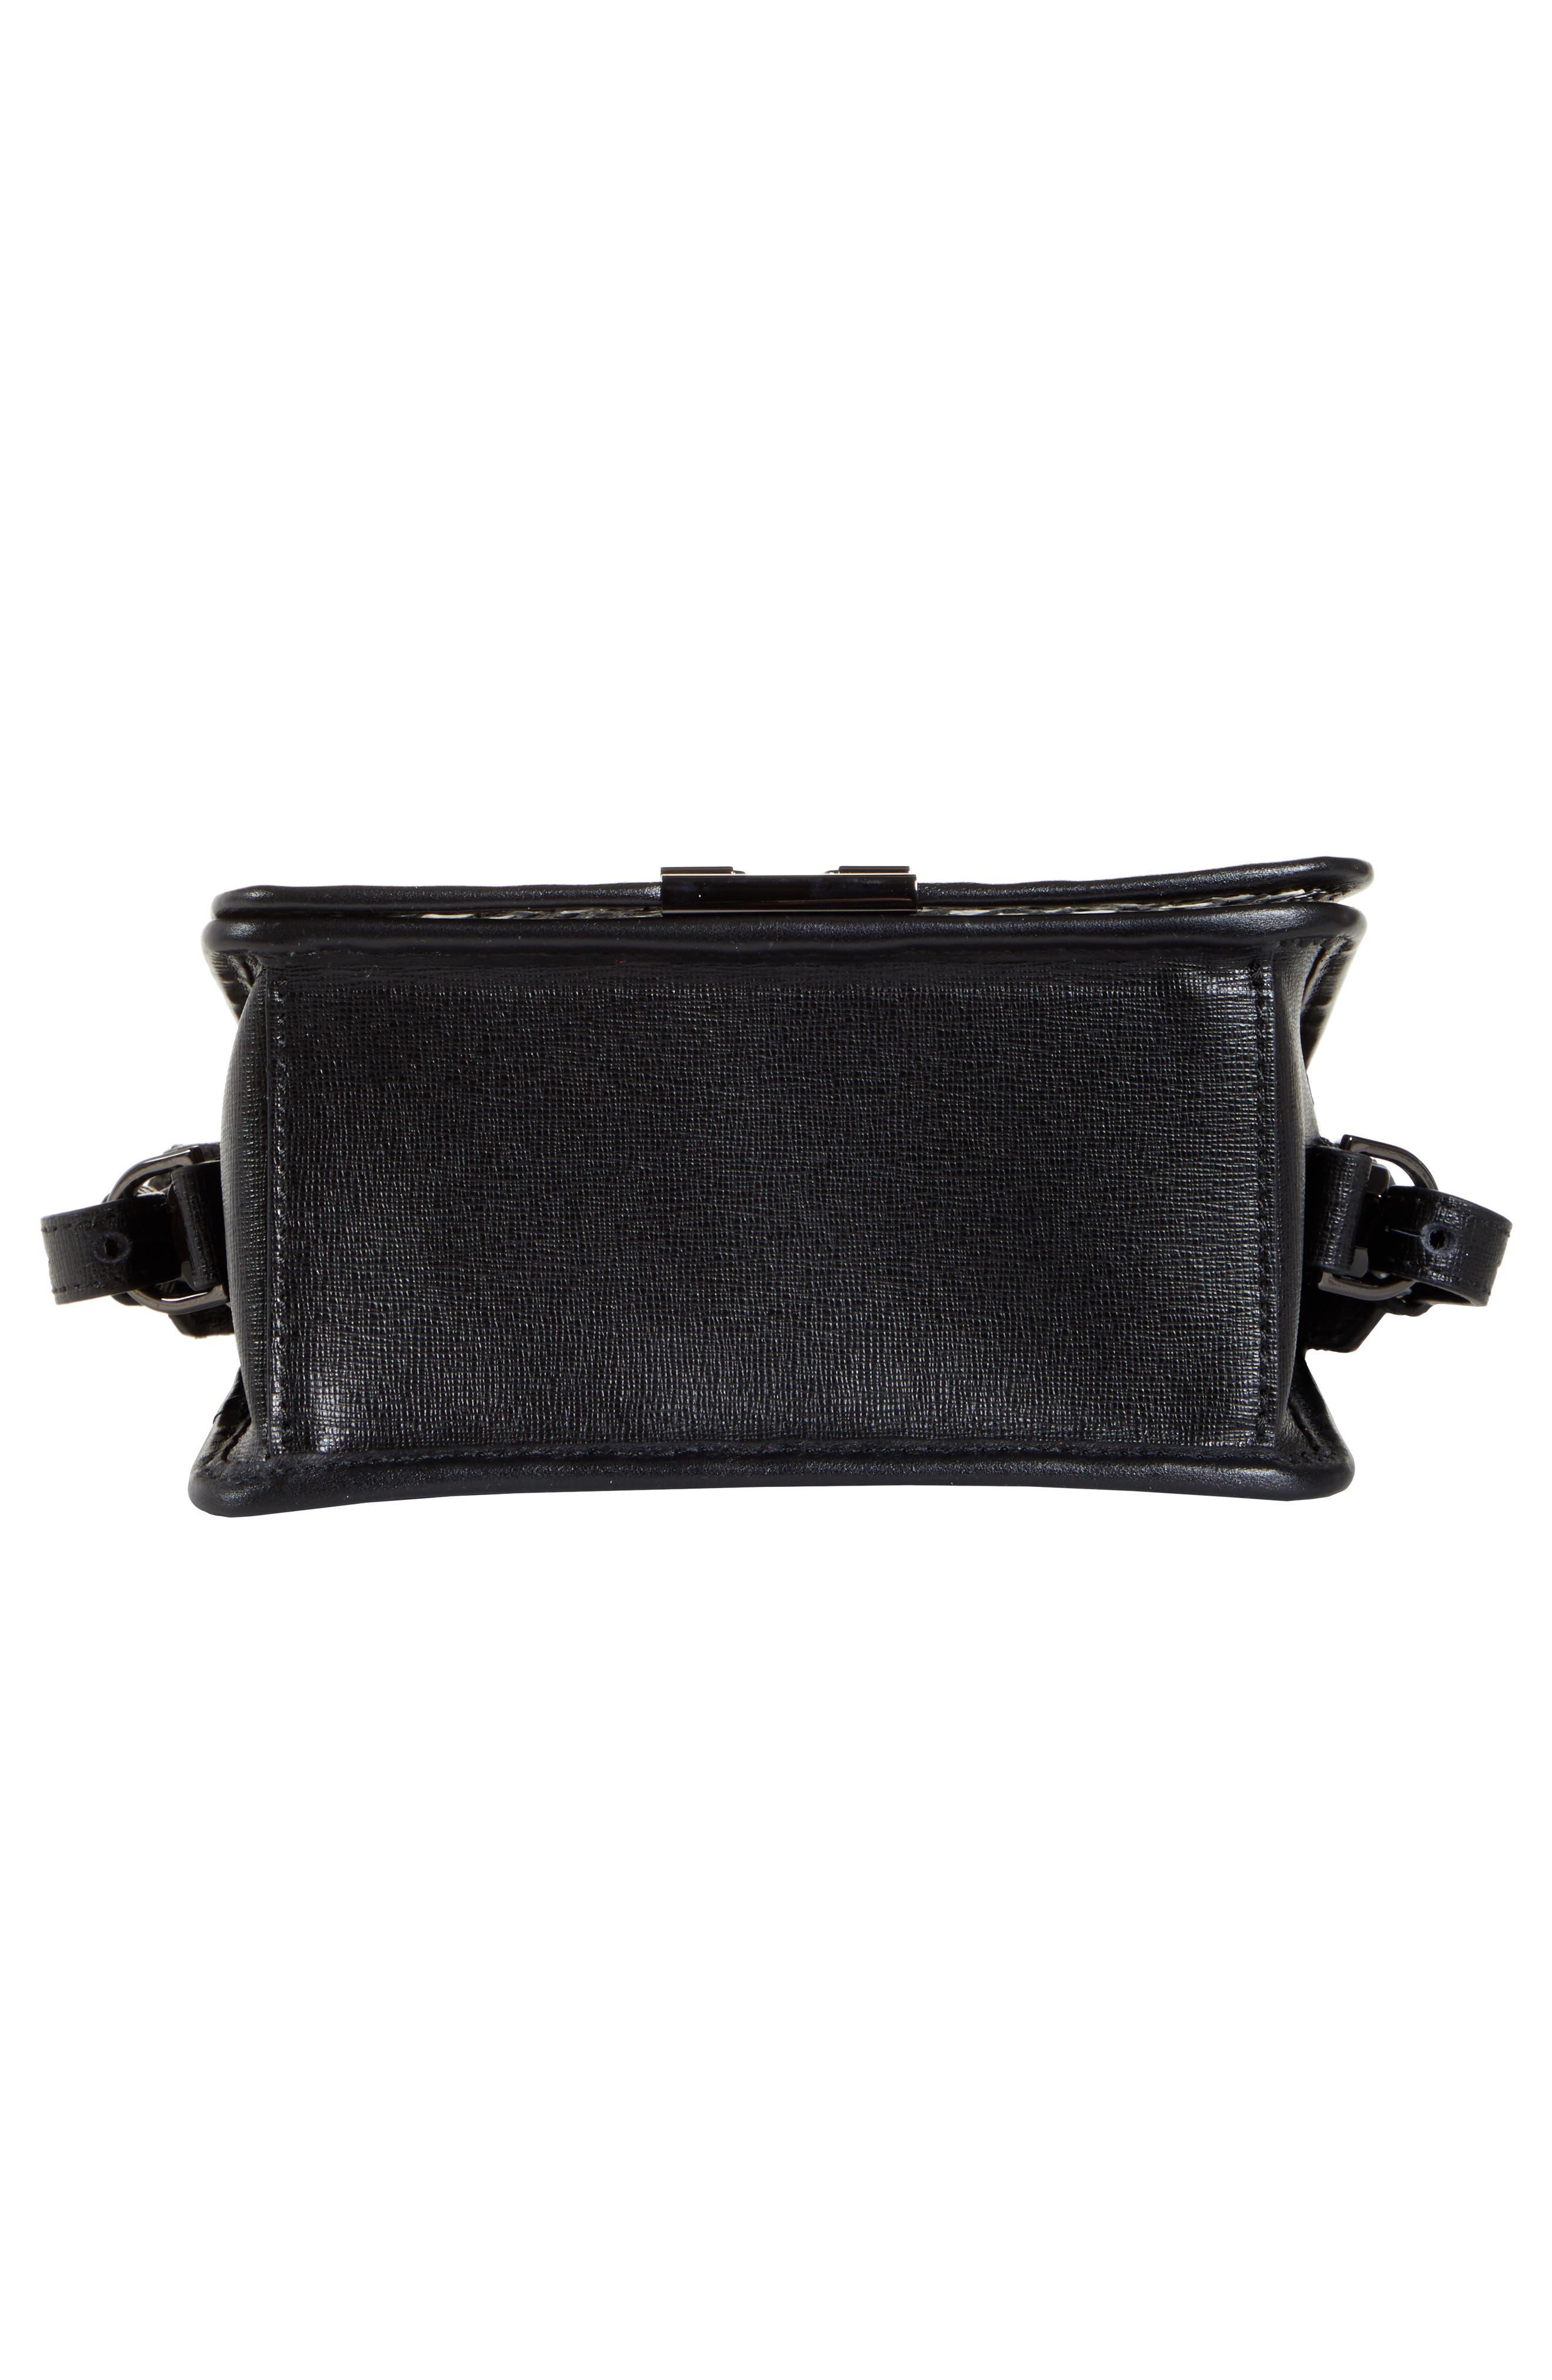 OFF-WHITE, Net PVC Flap Bag, Alternate thumbnail 7, color, BLACK